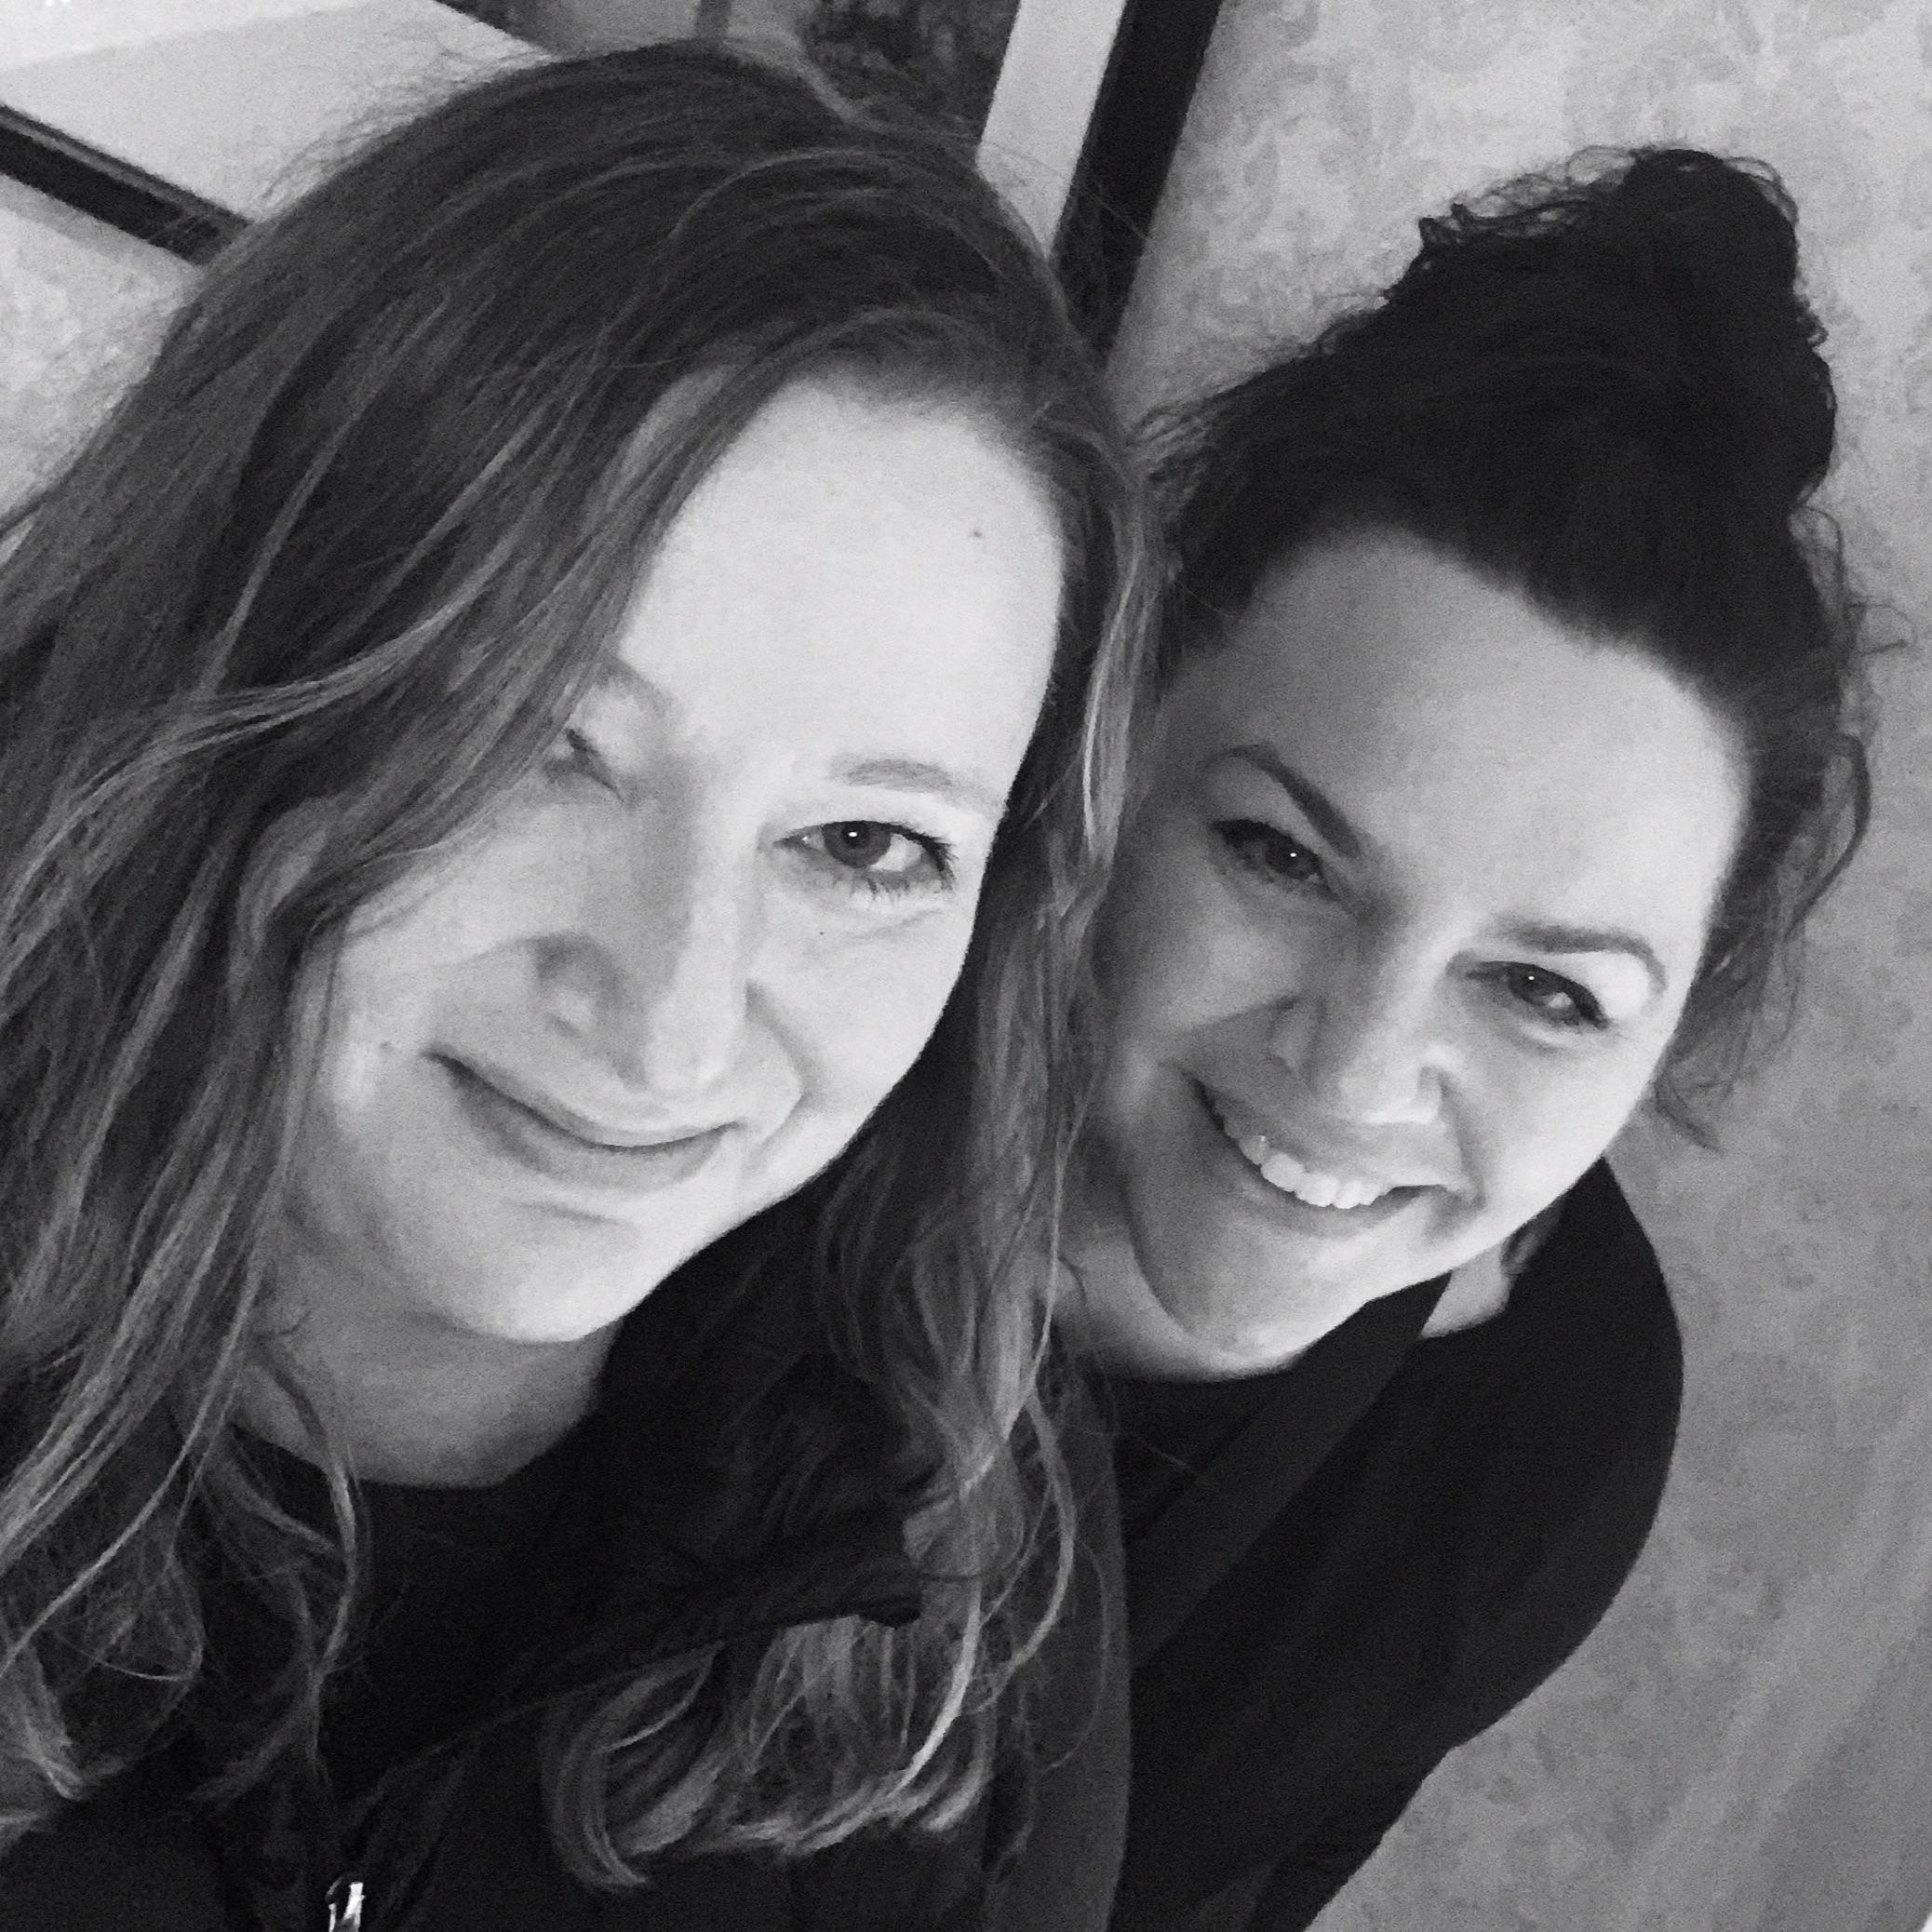 Perks Ep. 2 |Tricia Taylor and Jennie Mulhall | Gamma Girls Talk Books | 6-7-2019